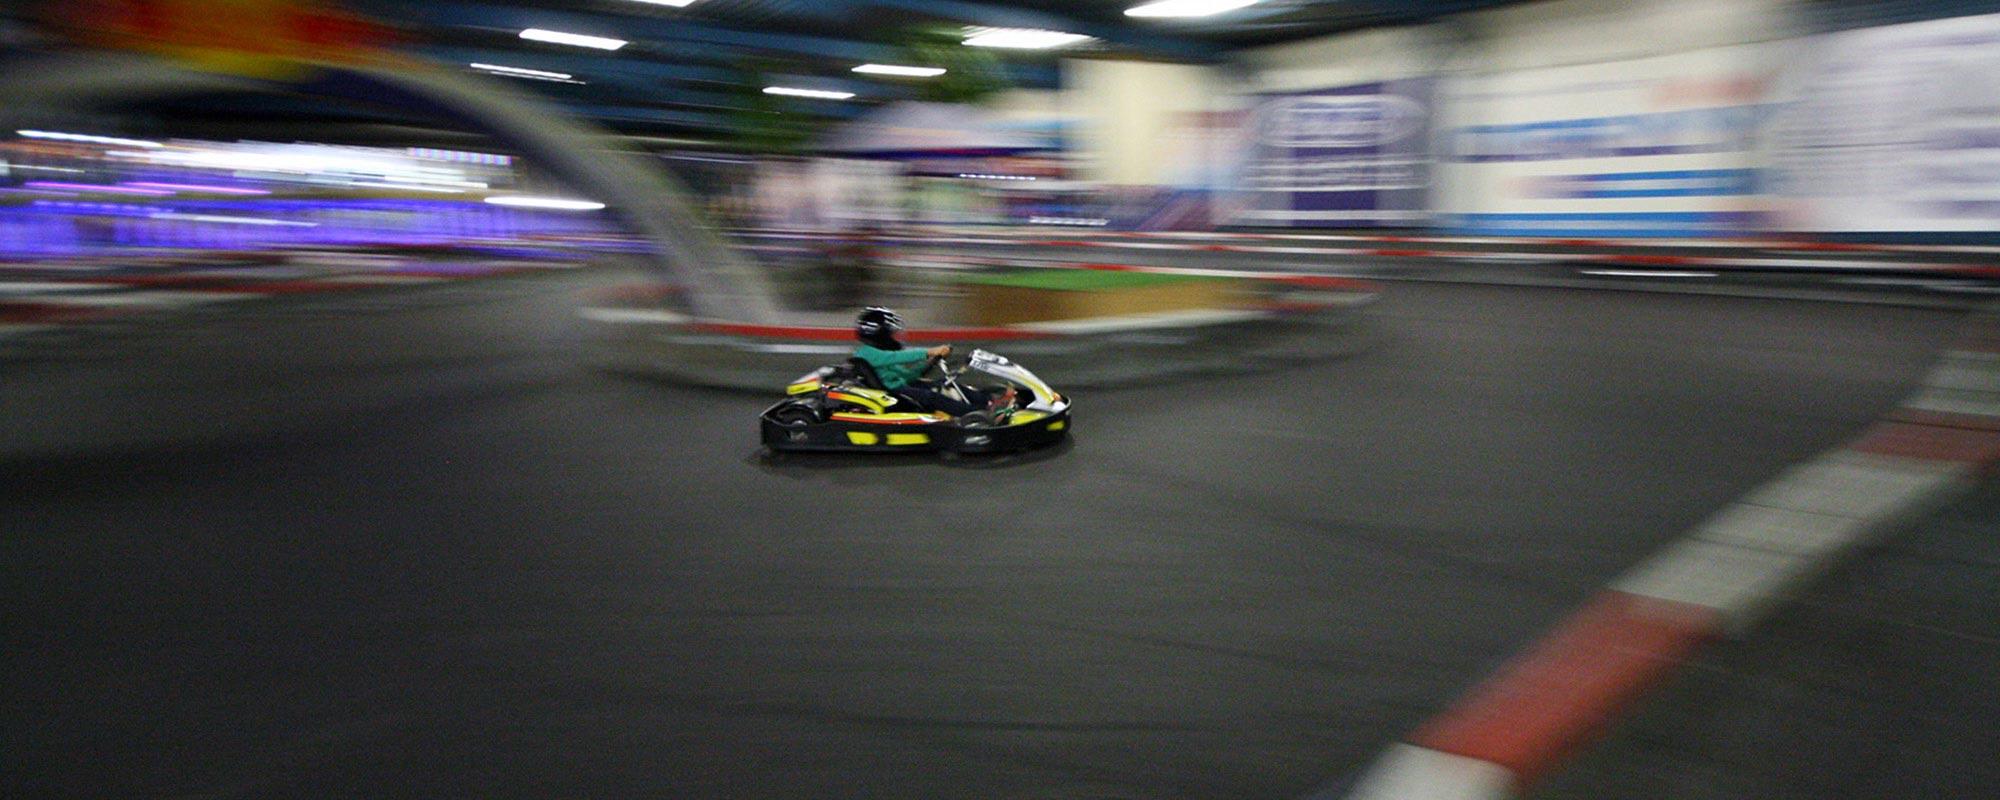 ebafkc-juniorkarting-2000x800-22